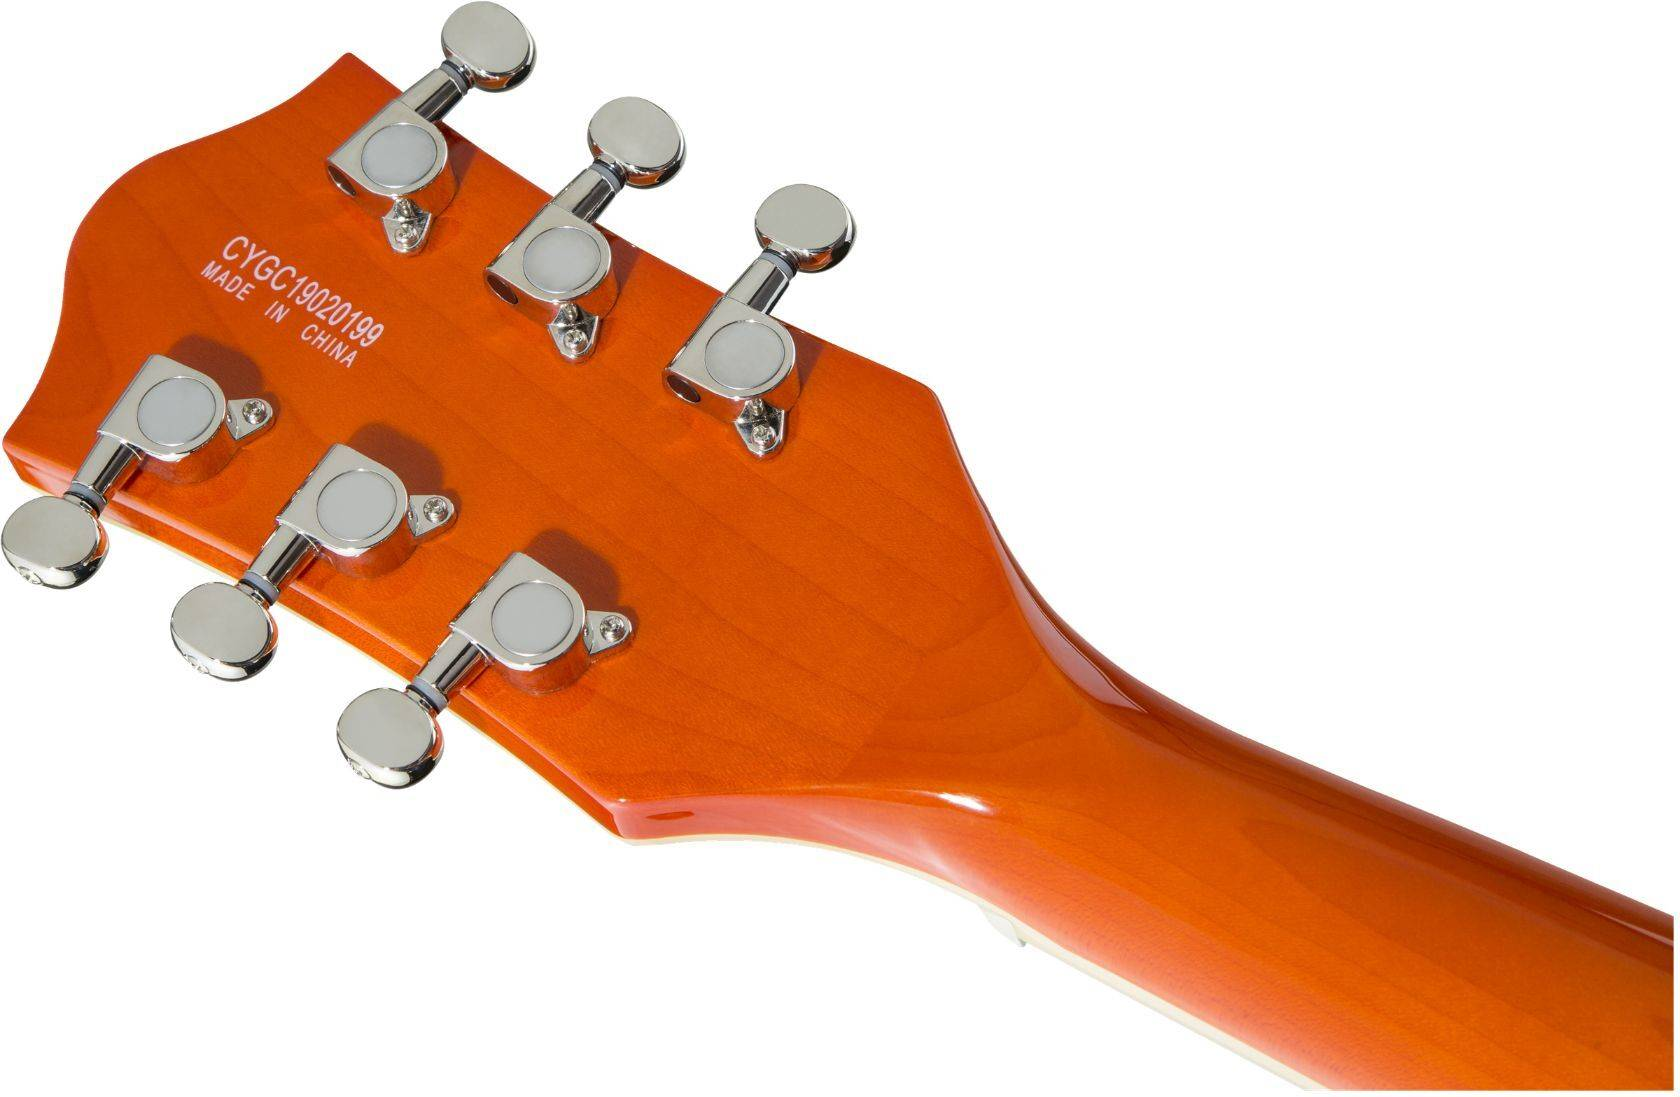 Guitarra Electrica Gretsch G5622T ELECTROMATIC CENTER BLOCK DOUBLE-CUT con BIGSBY